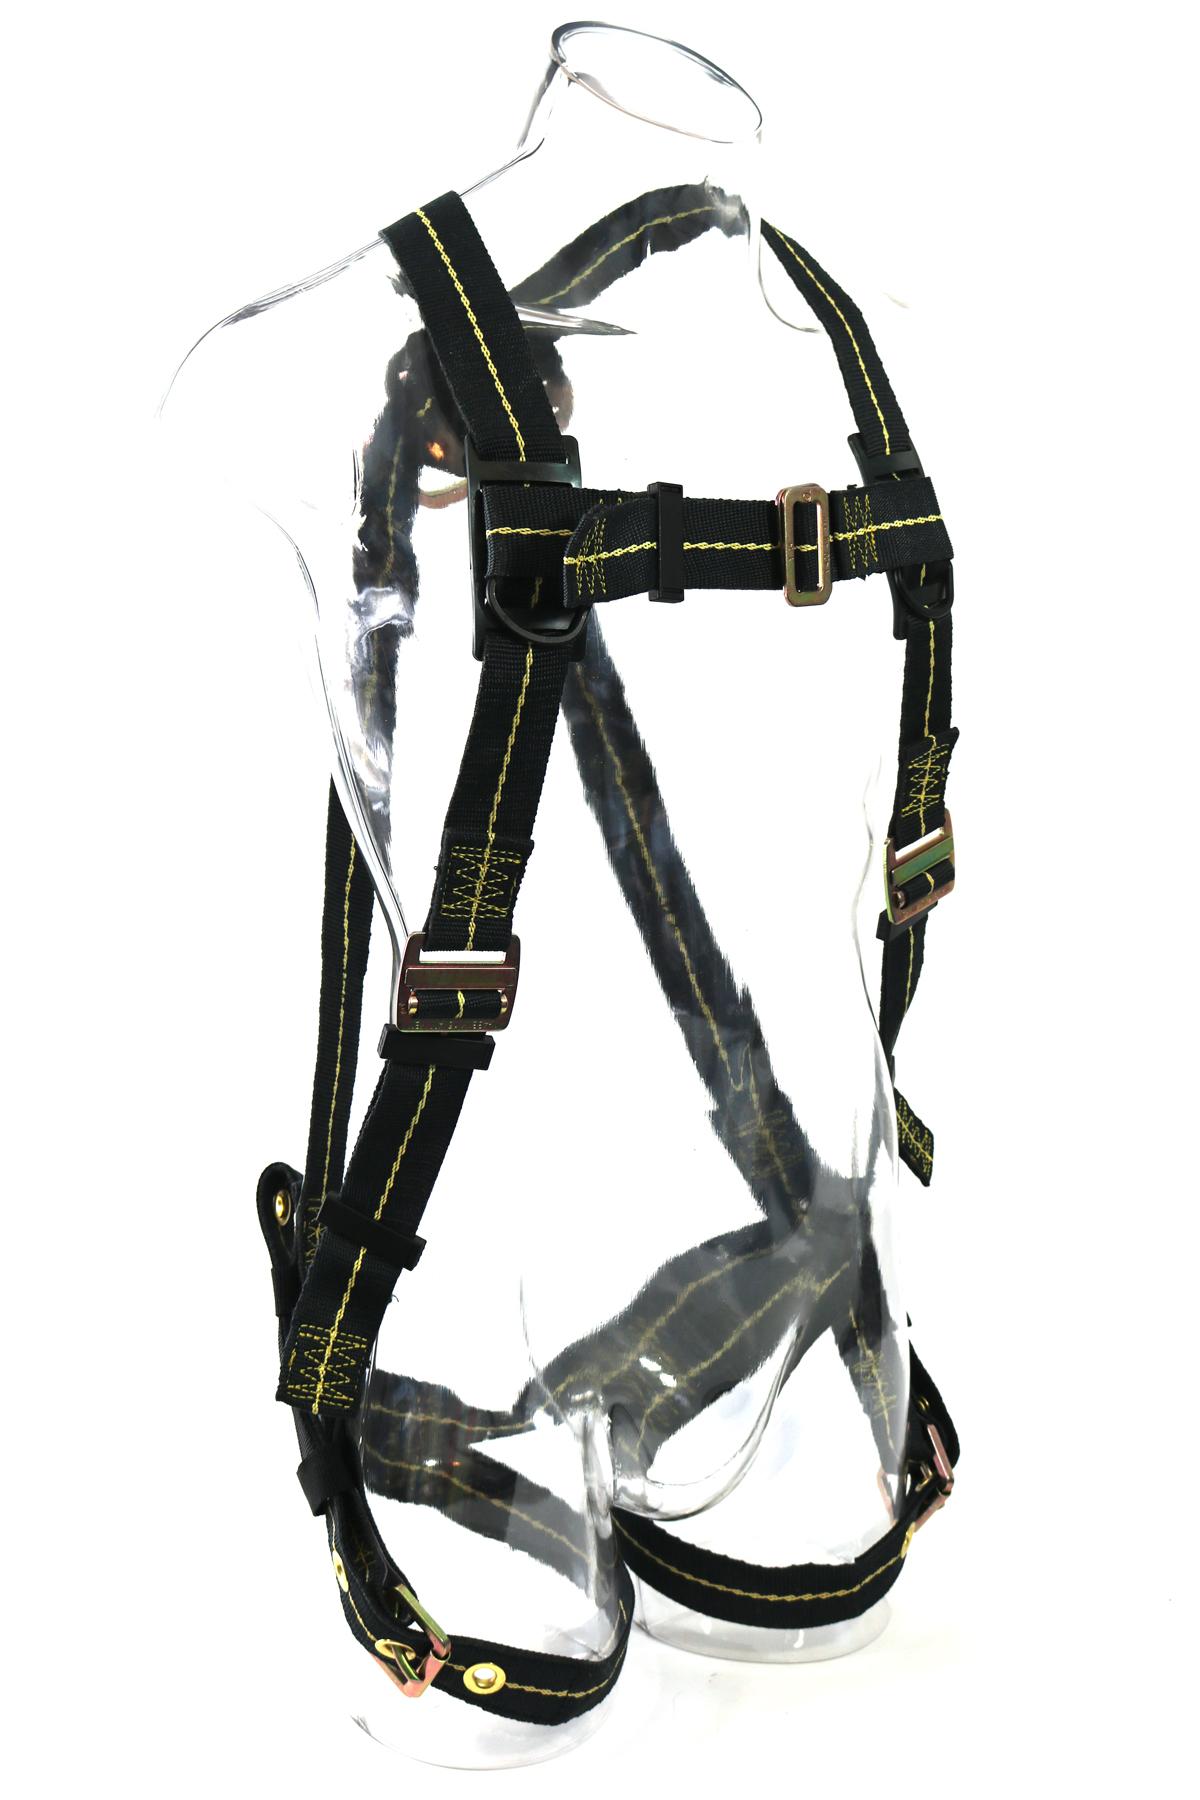 fall protection harness osha